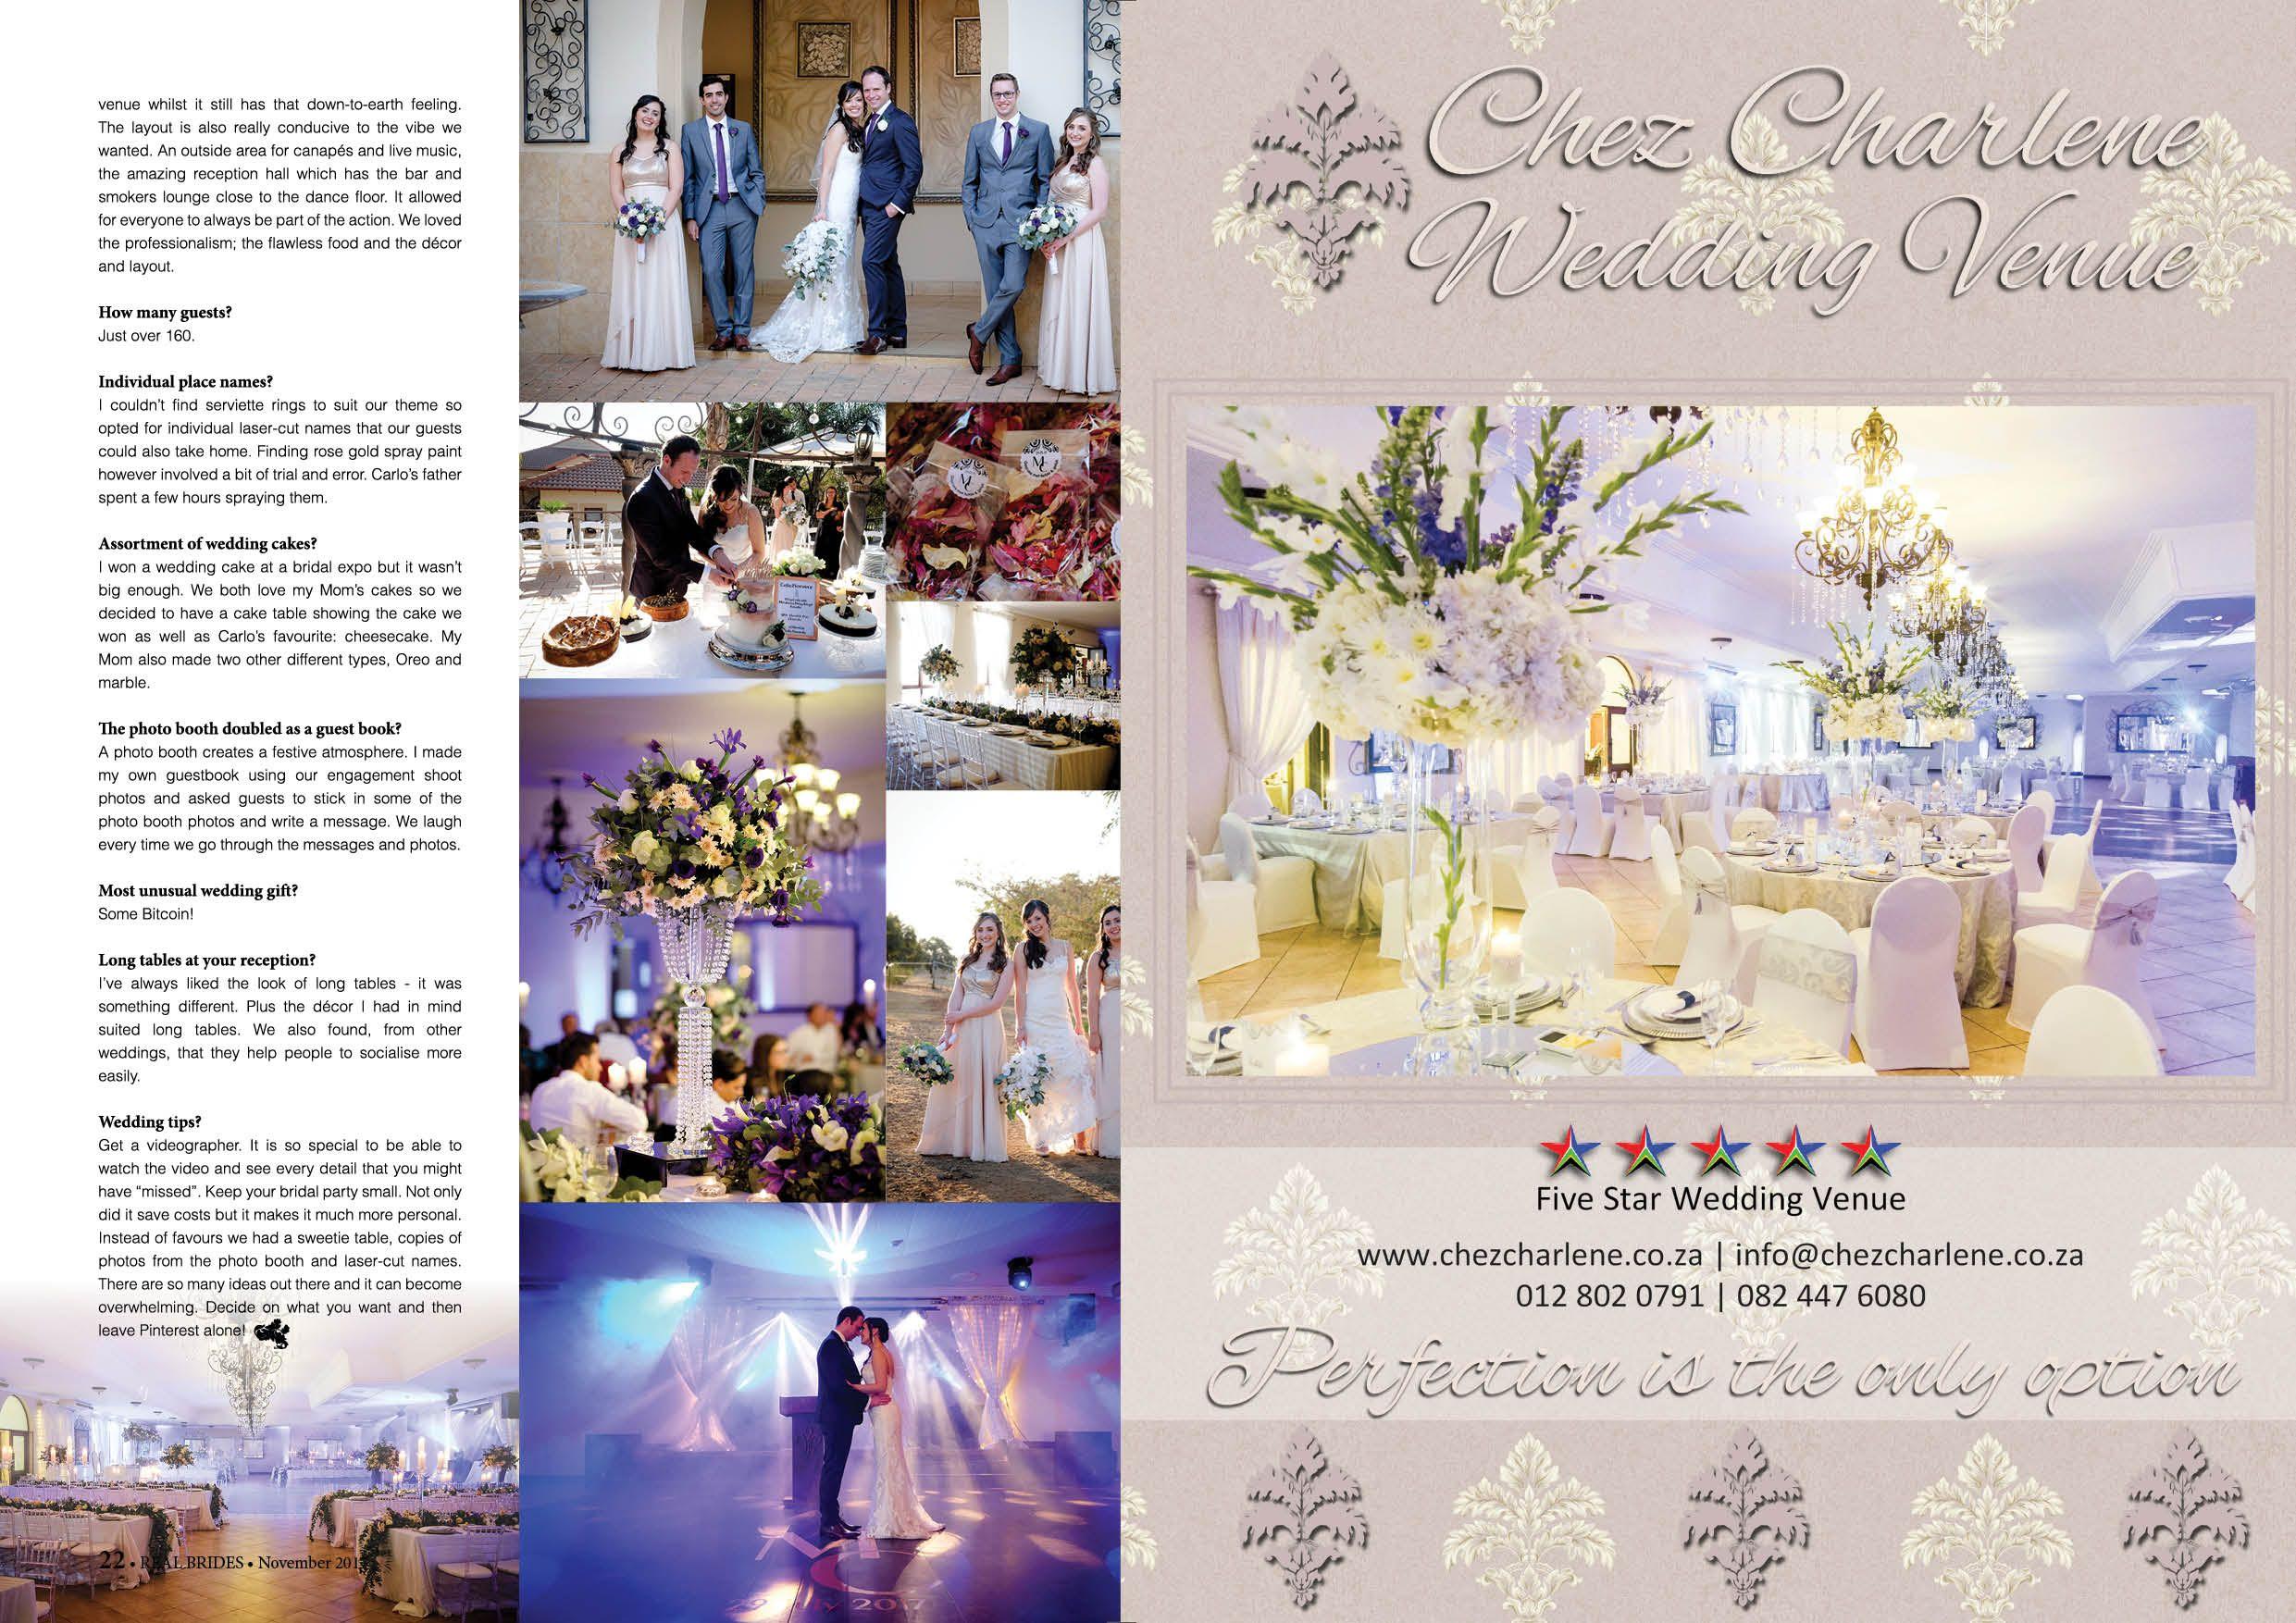 Chez Charlene 5 Star Wedding Venue, Pretoria East, Gauteng ...